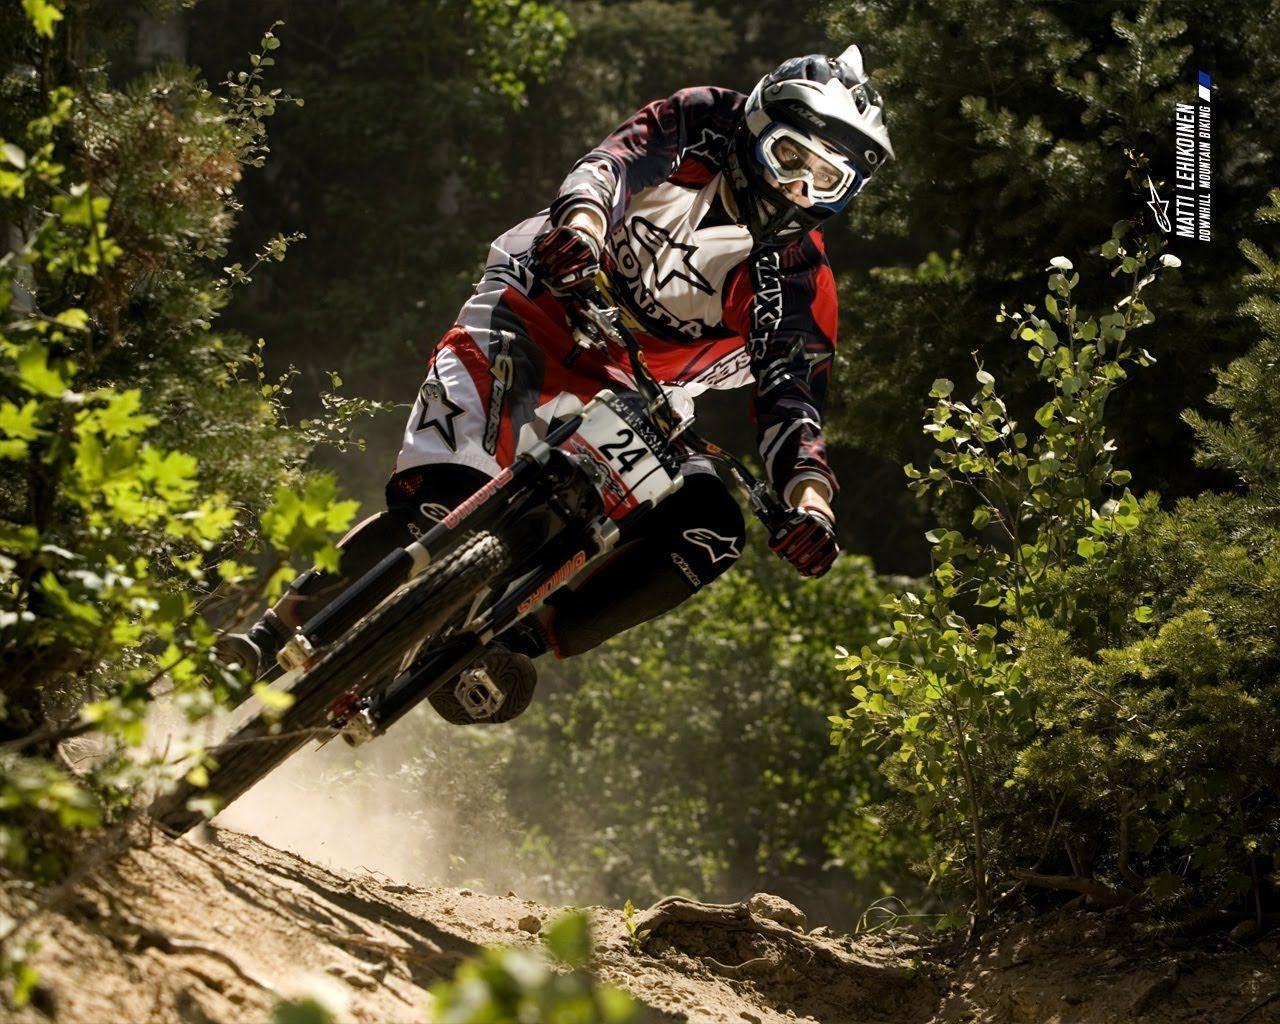 Extreme Mountain Biking Wallpaper: Downhill Mountain Bike 2017 Wallpapers